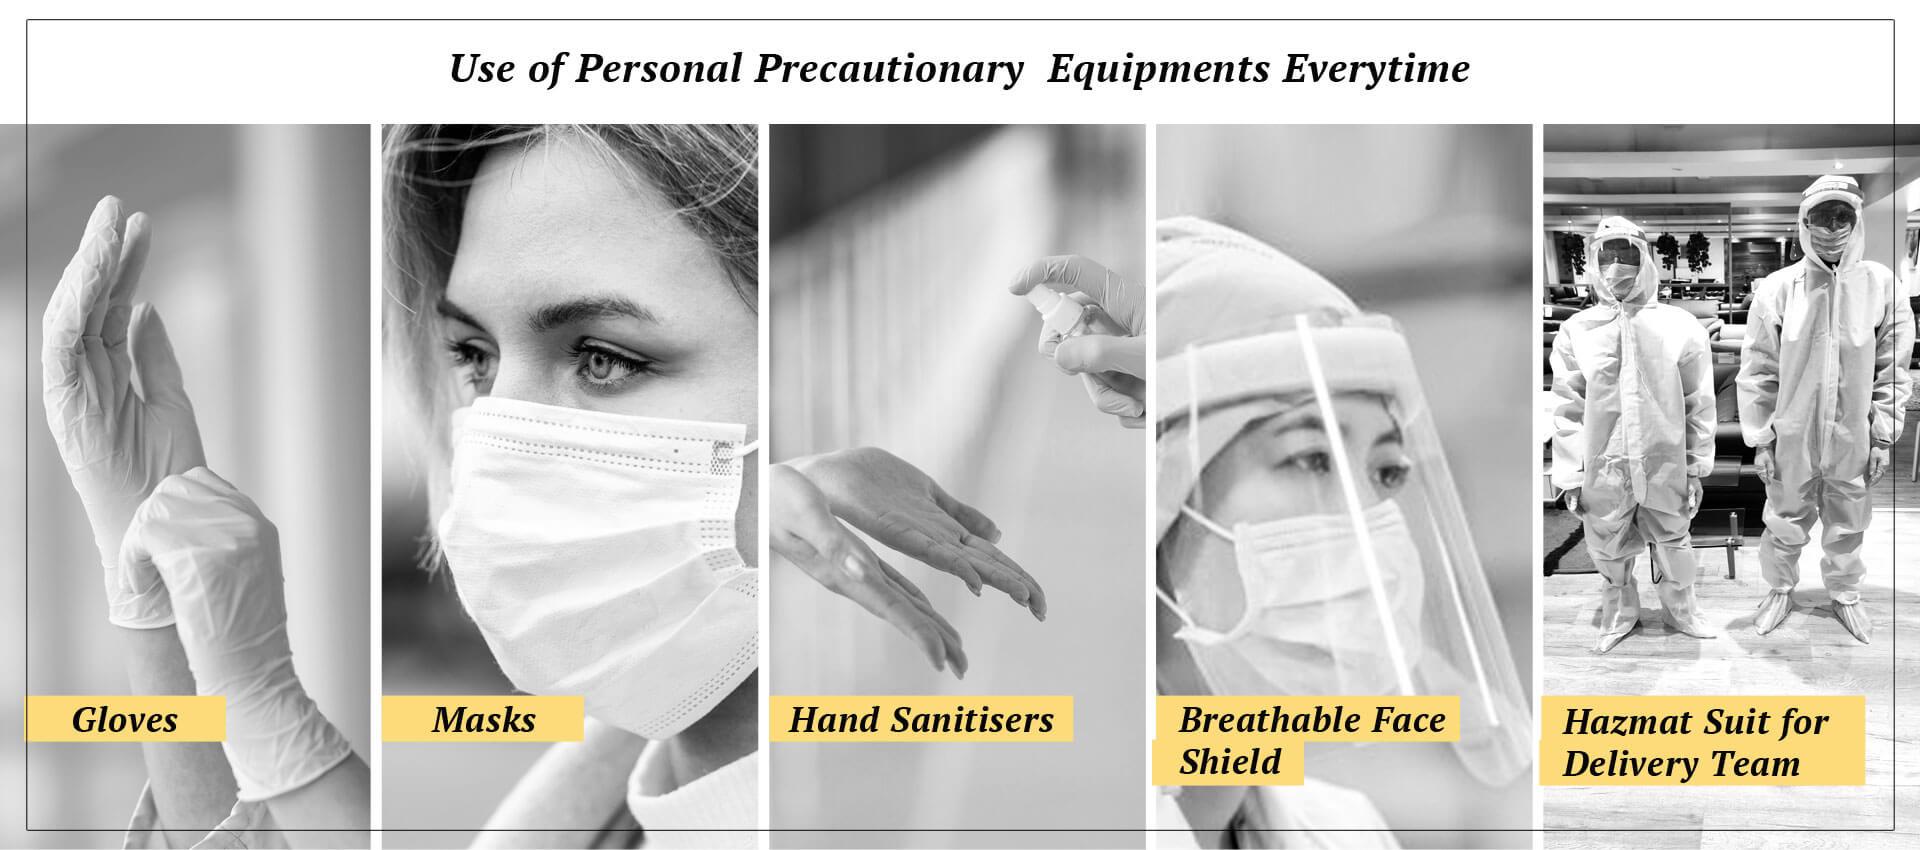 Use of personal precautionary equipment everytime